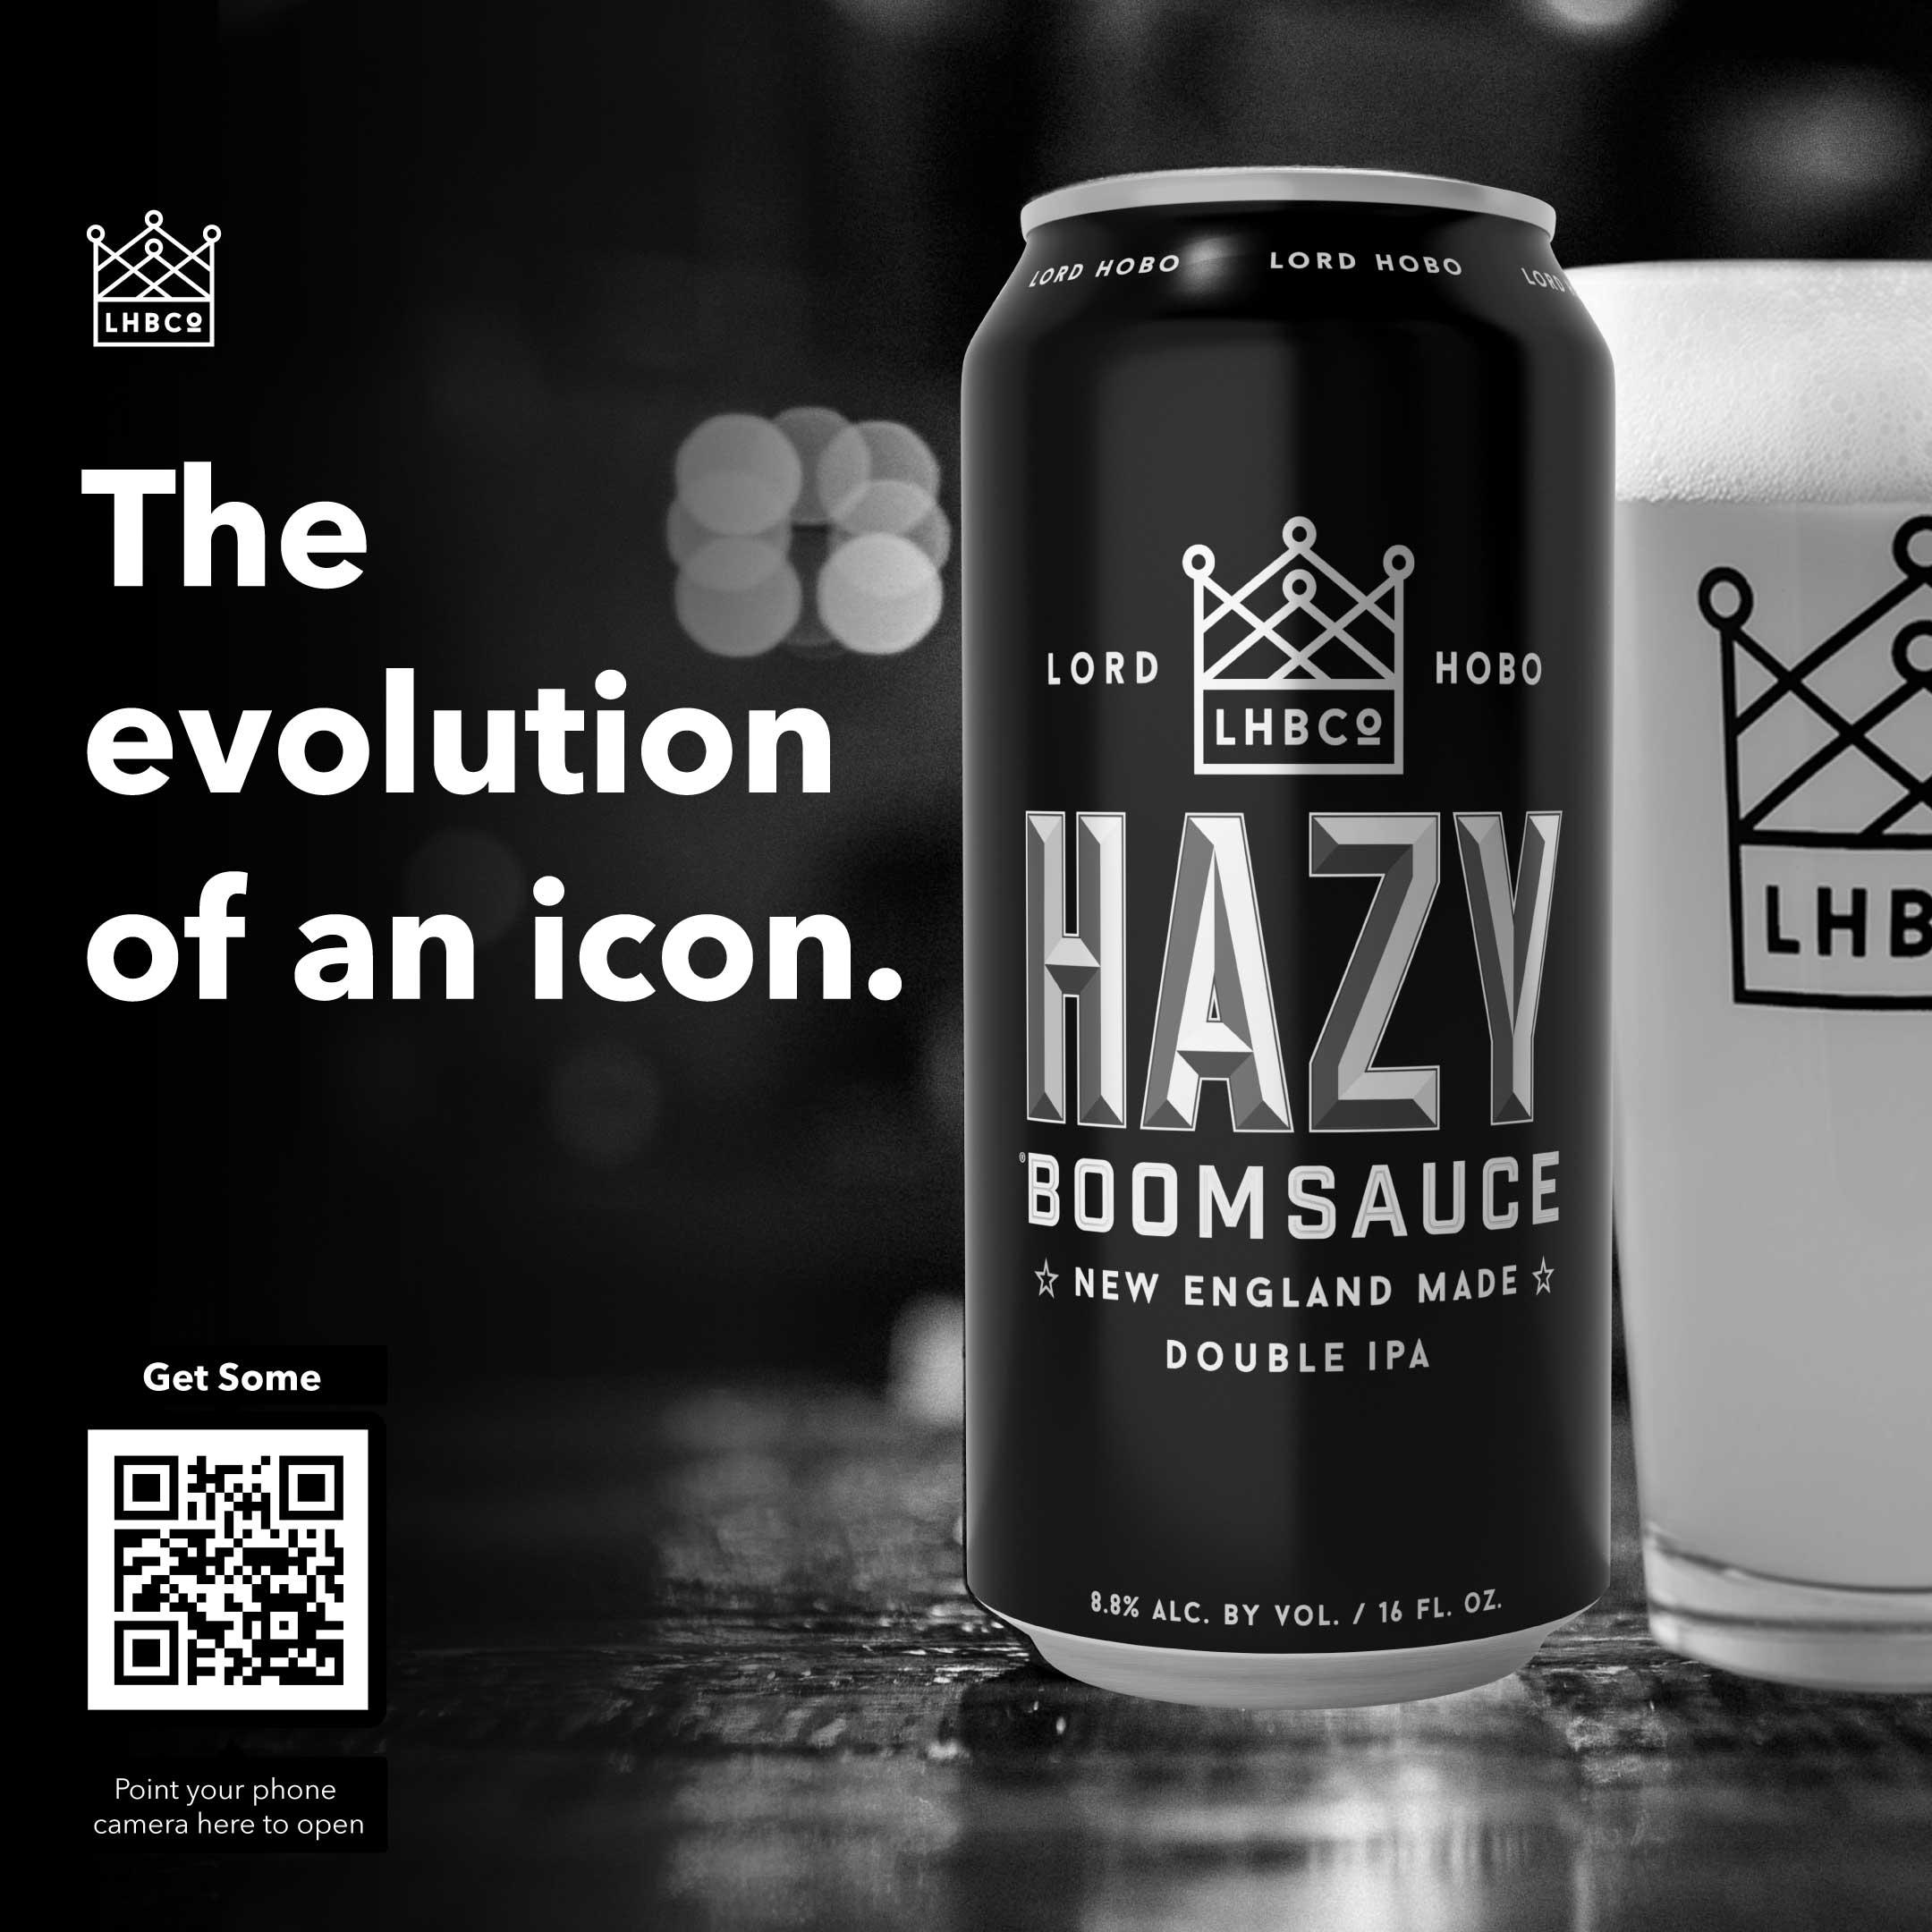 lord-hobo-soofa-boomsauce-hazy-evolution-icon.jpg